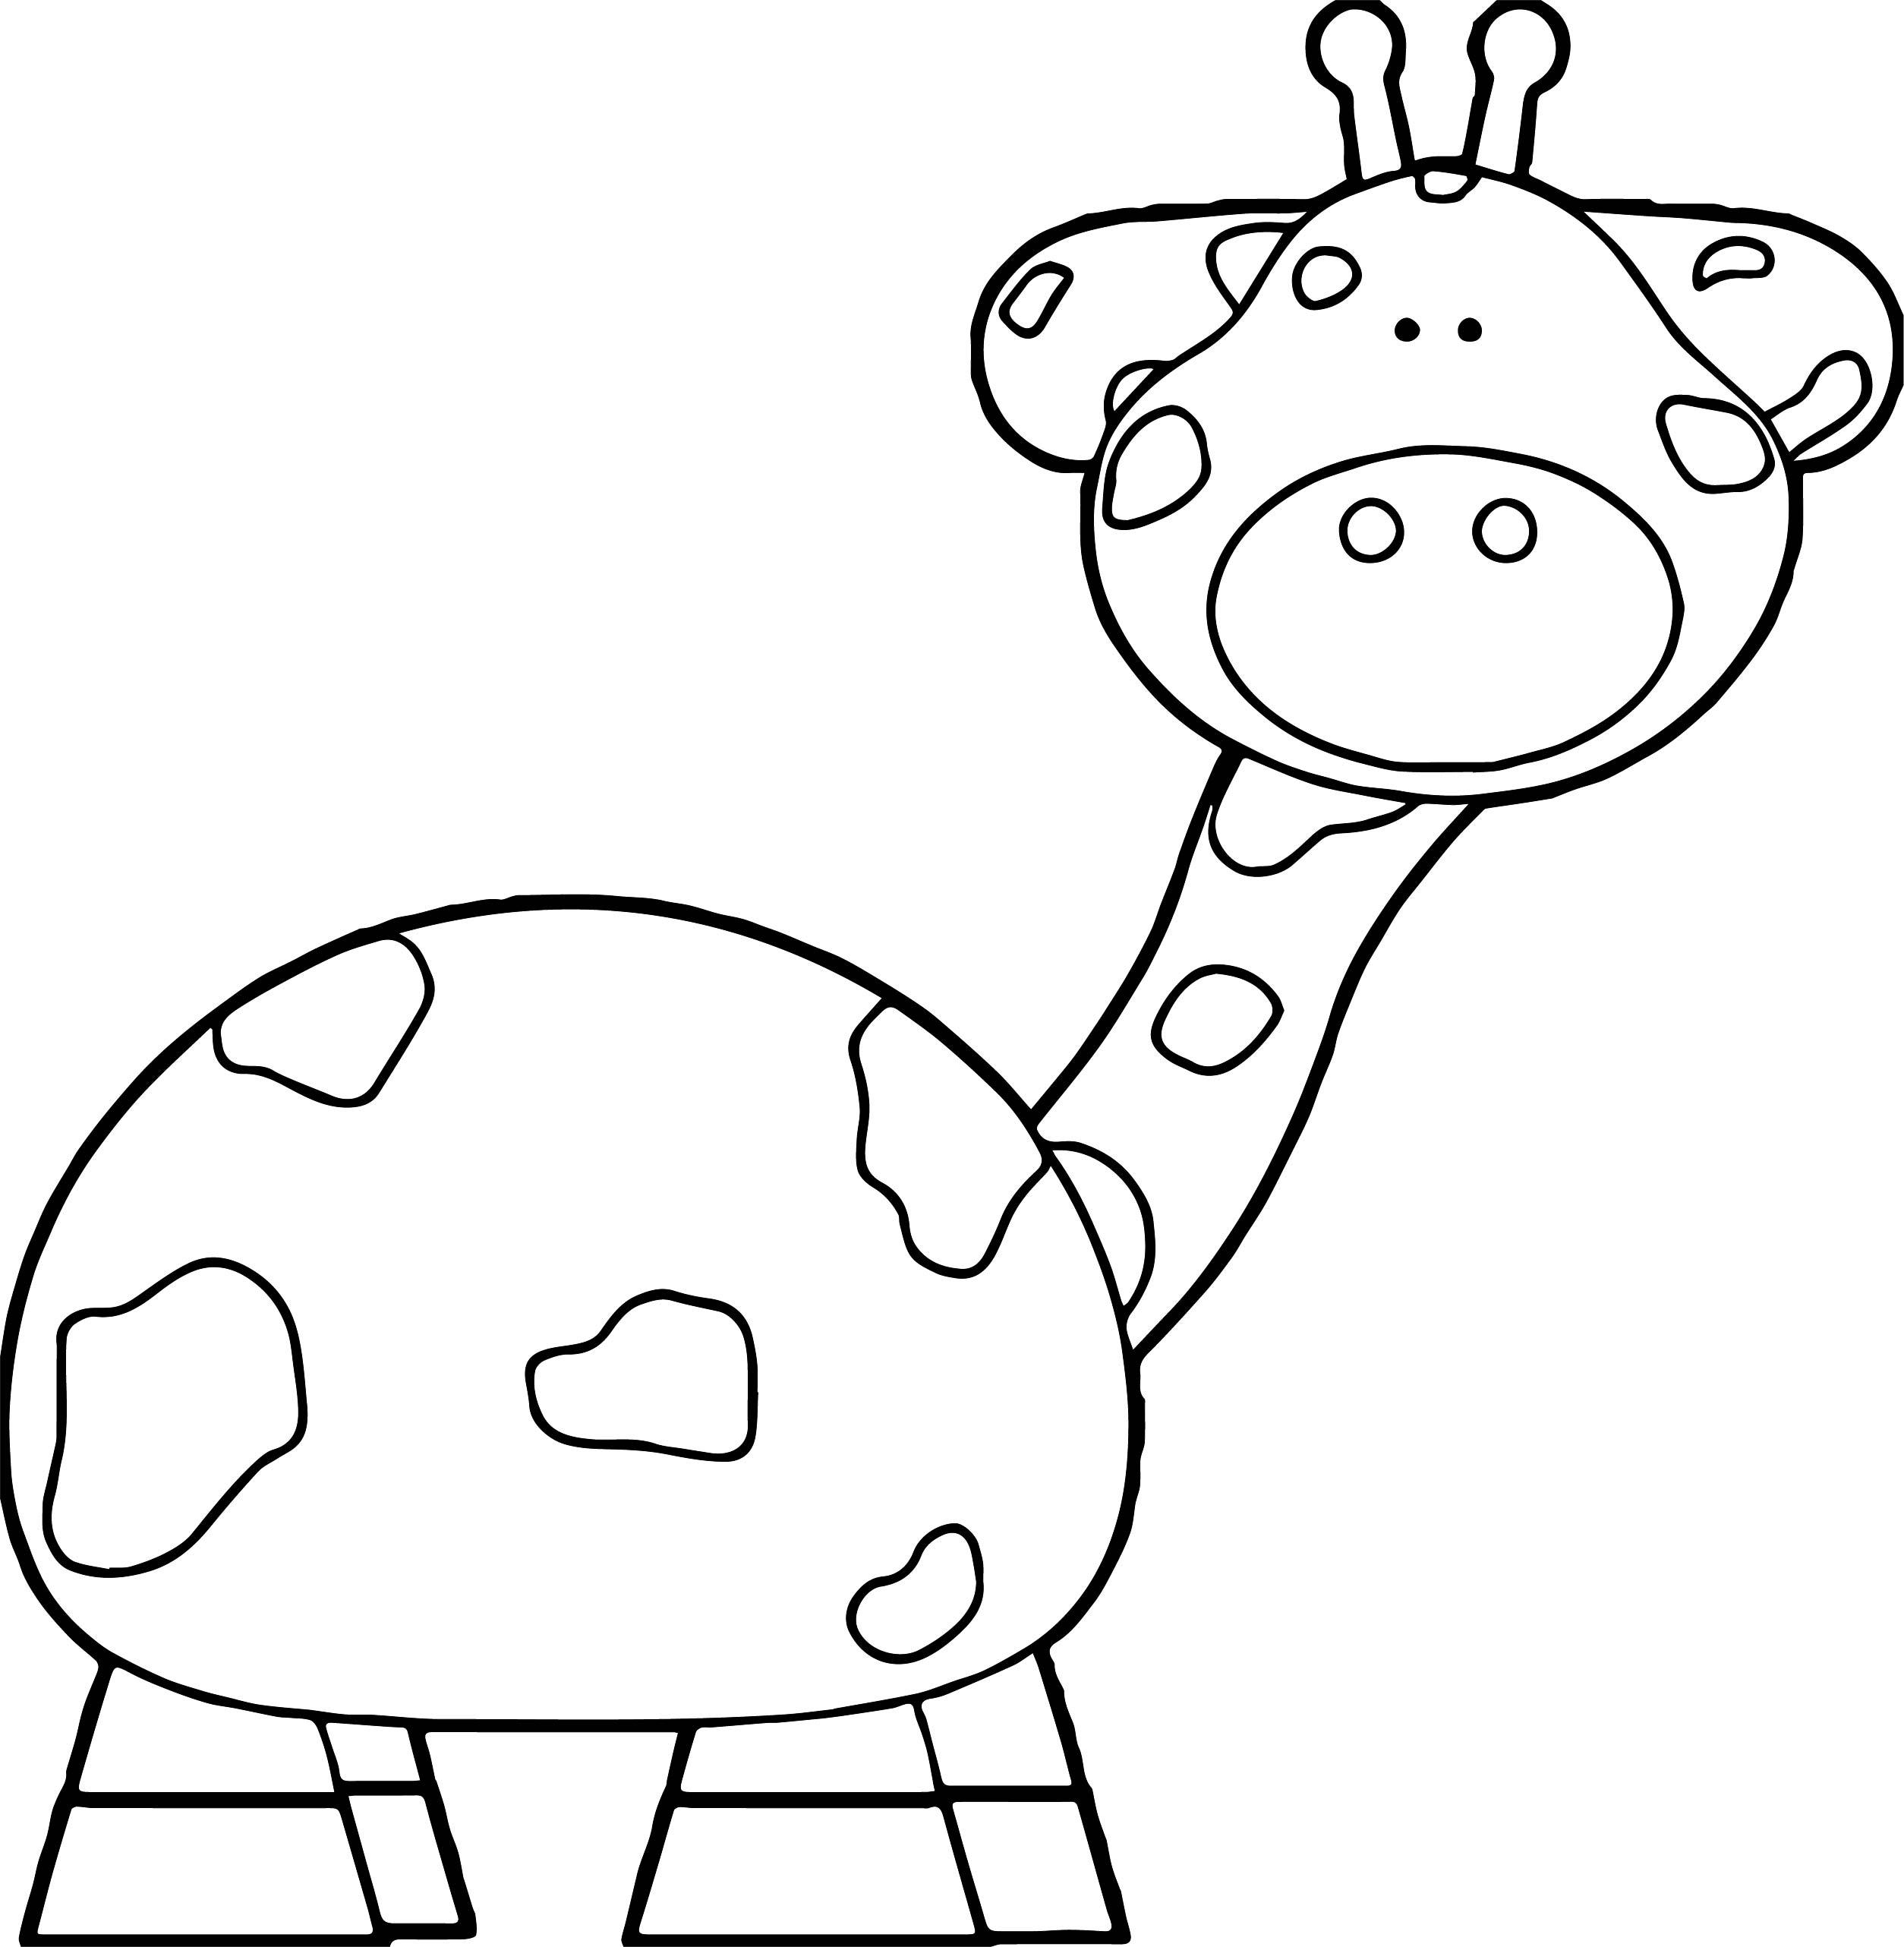 Giraffe Helpful Coloring Page